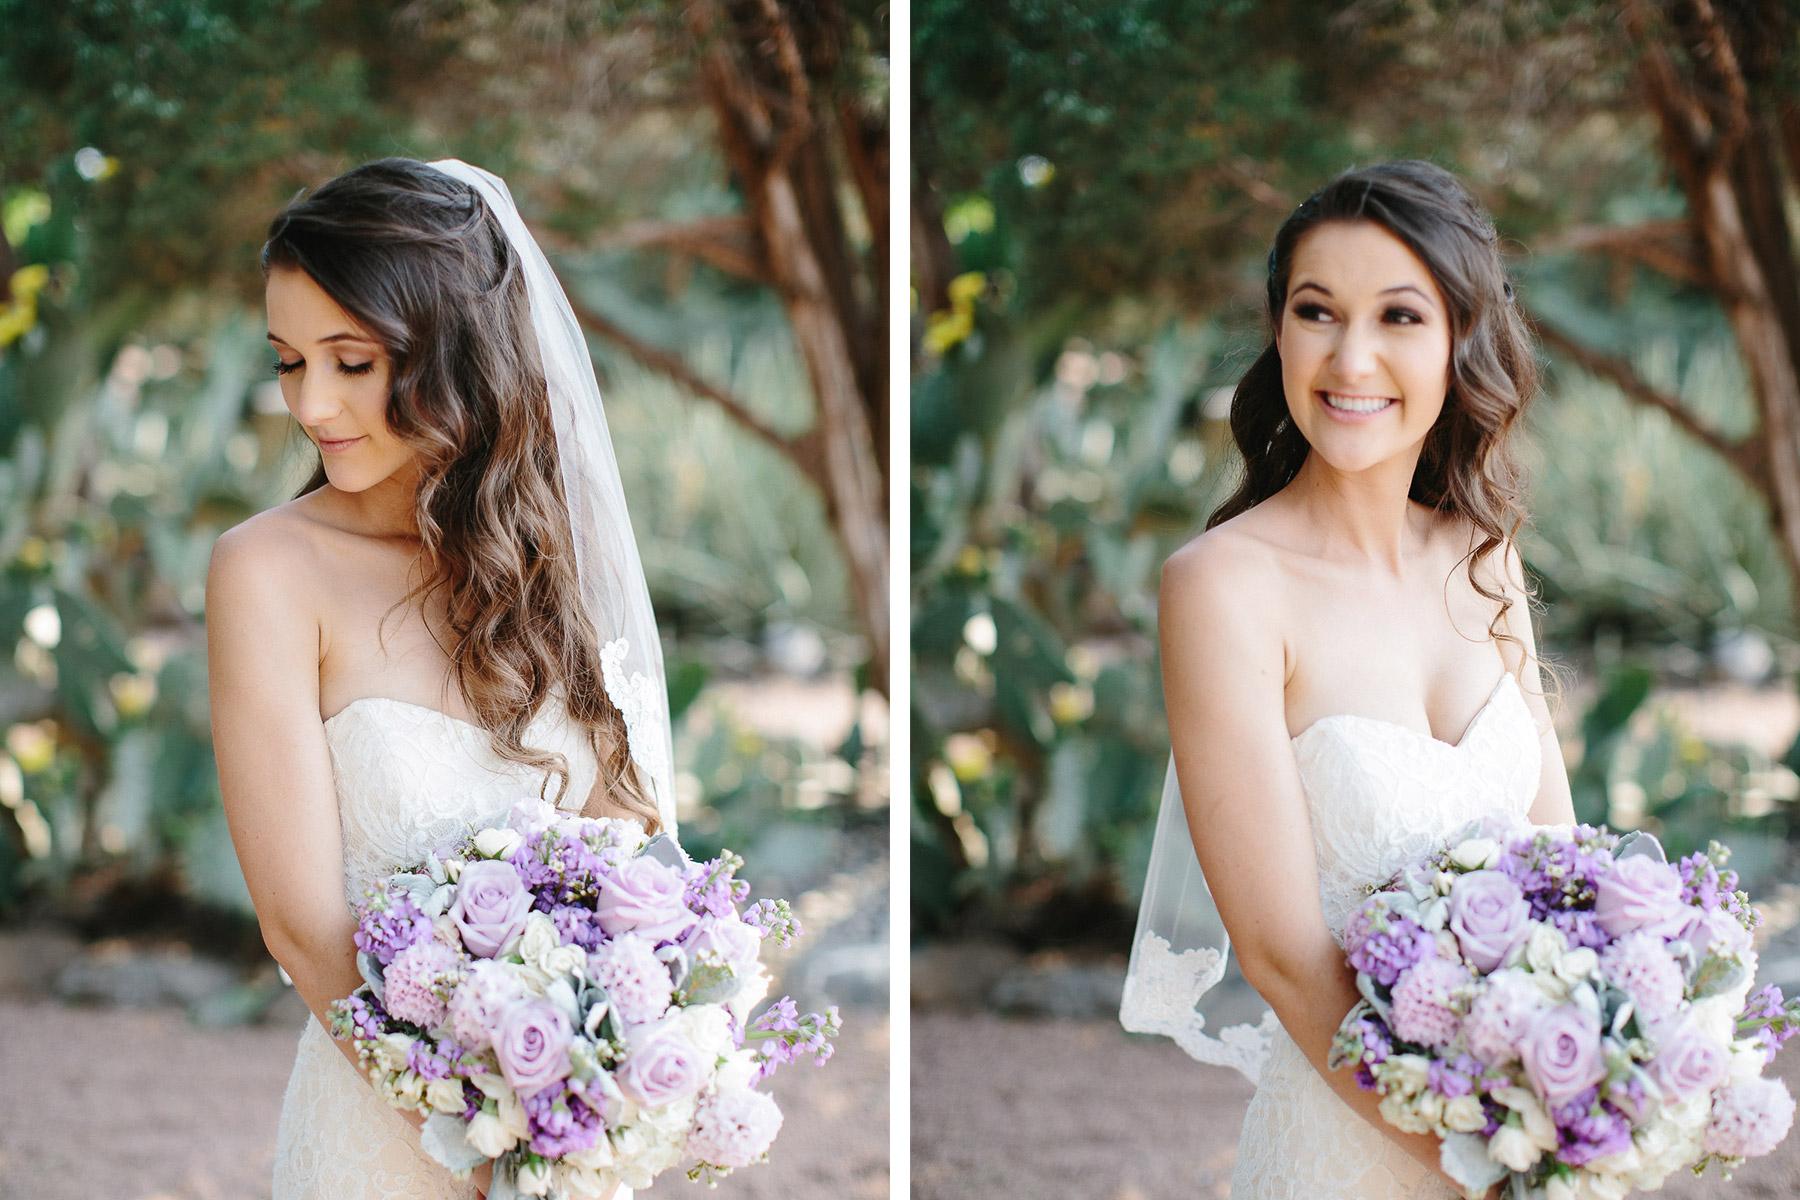 170528-Malkin-Wedding-Sedona-Arizona-Wedding-Photography-Sky-Ranch-Lodge-1025a.jpg